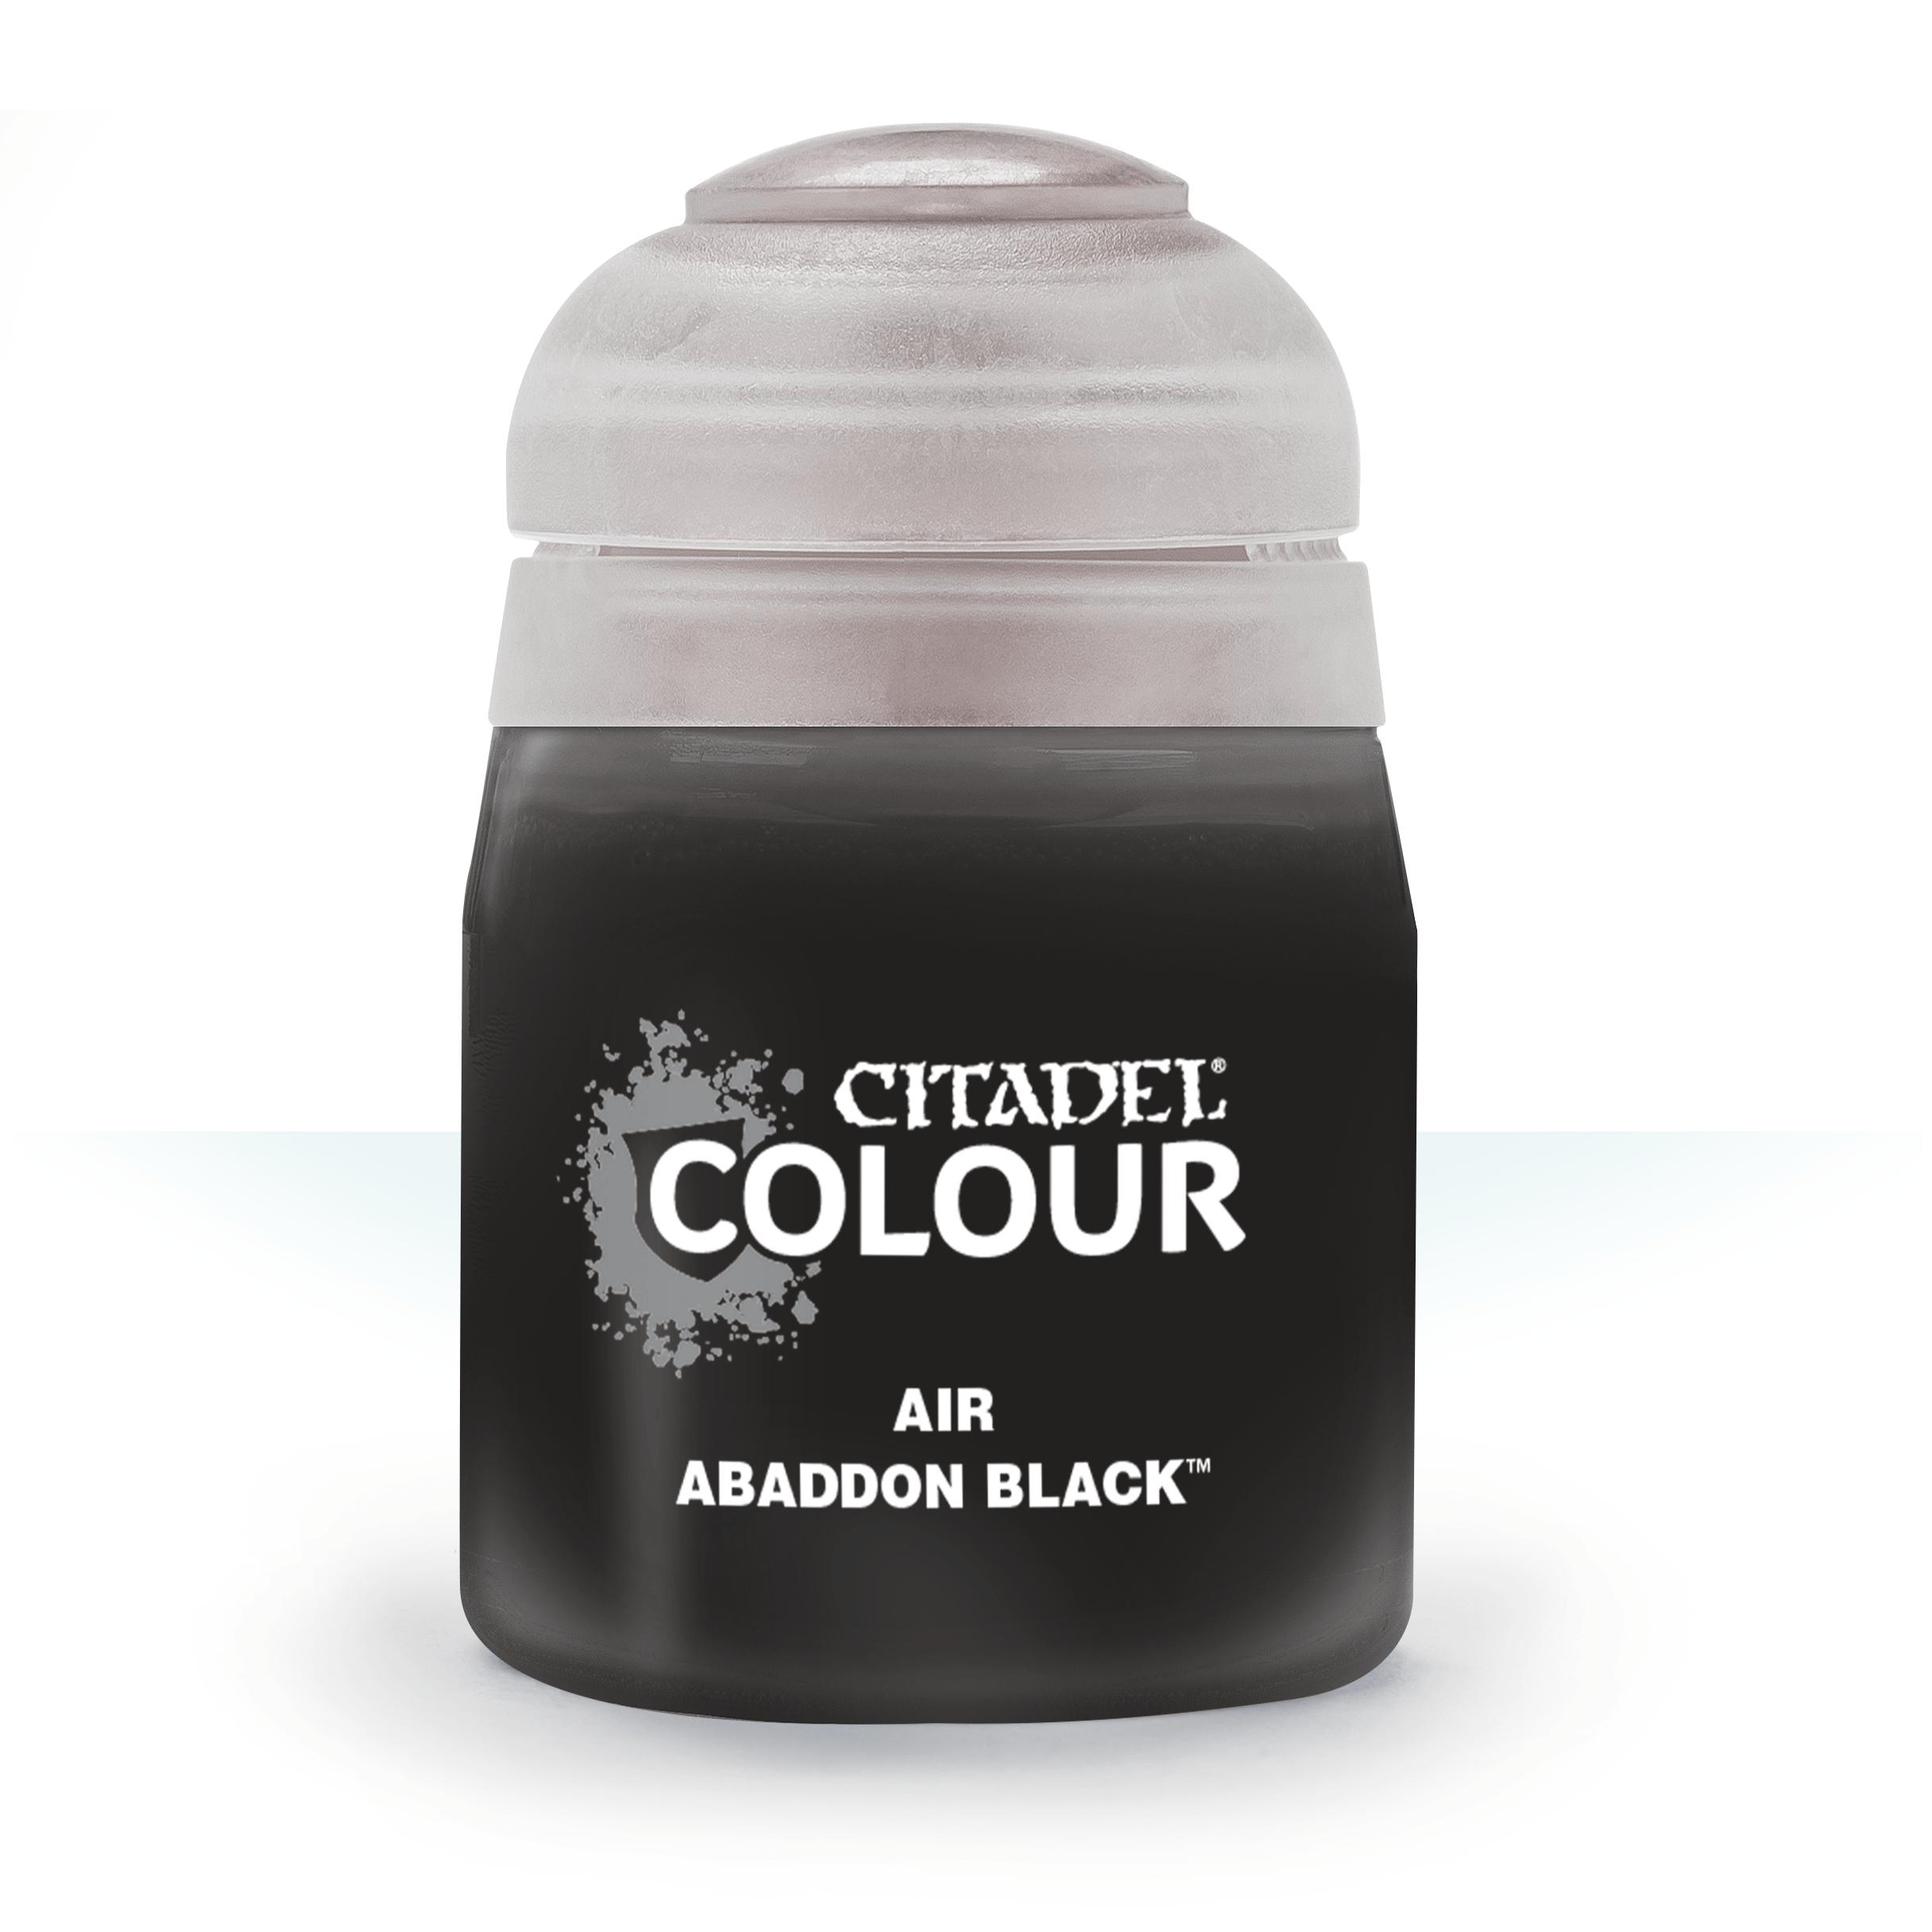 Abaddon Black, Citadel Air 24ml